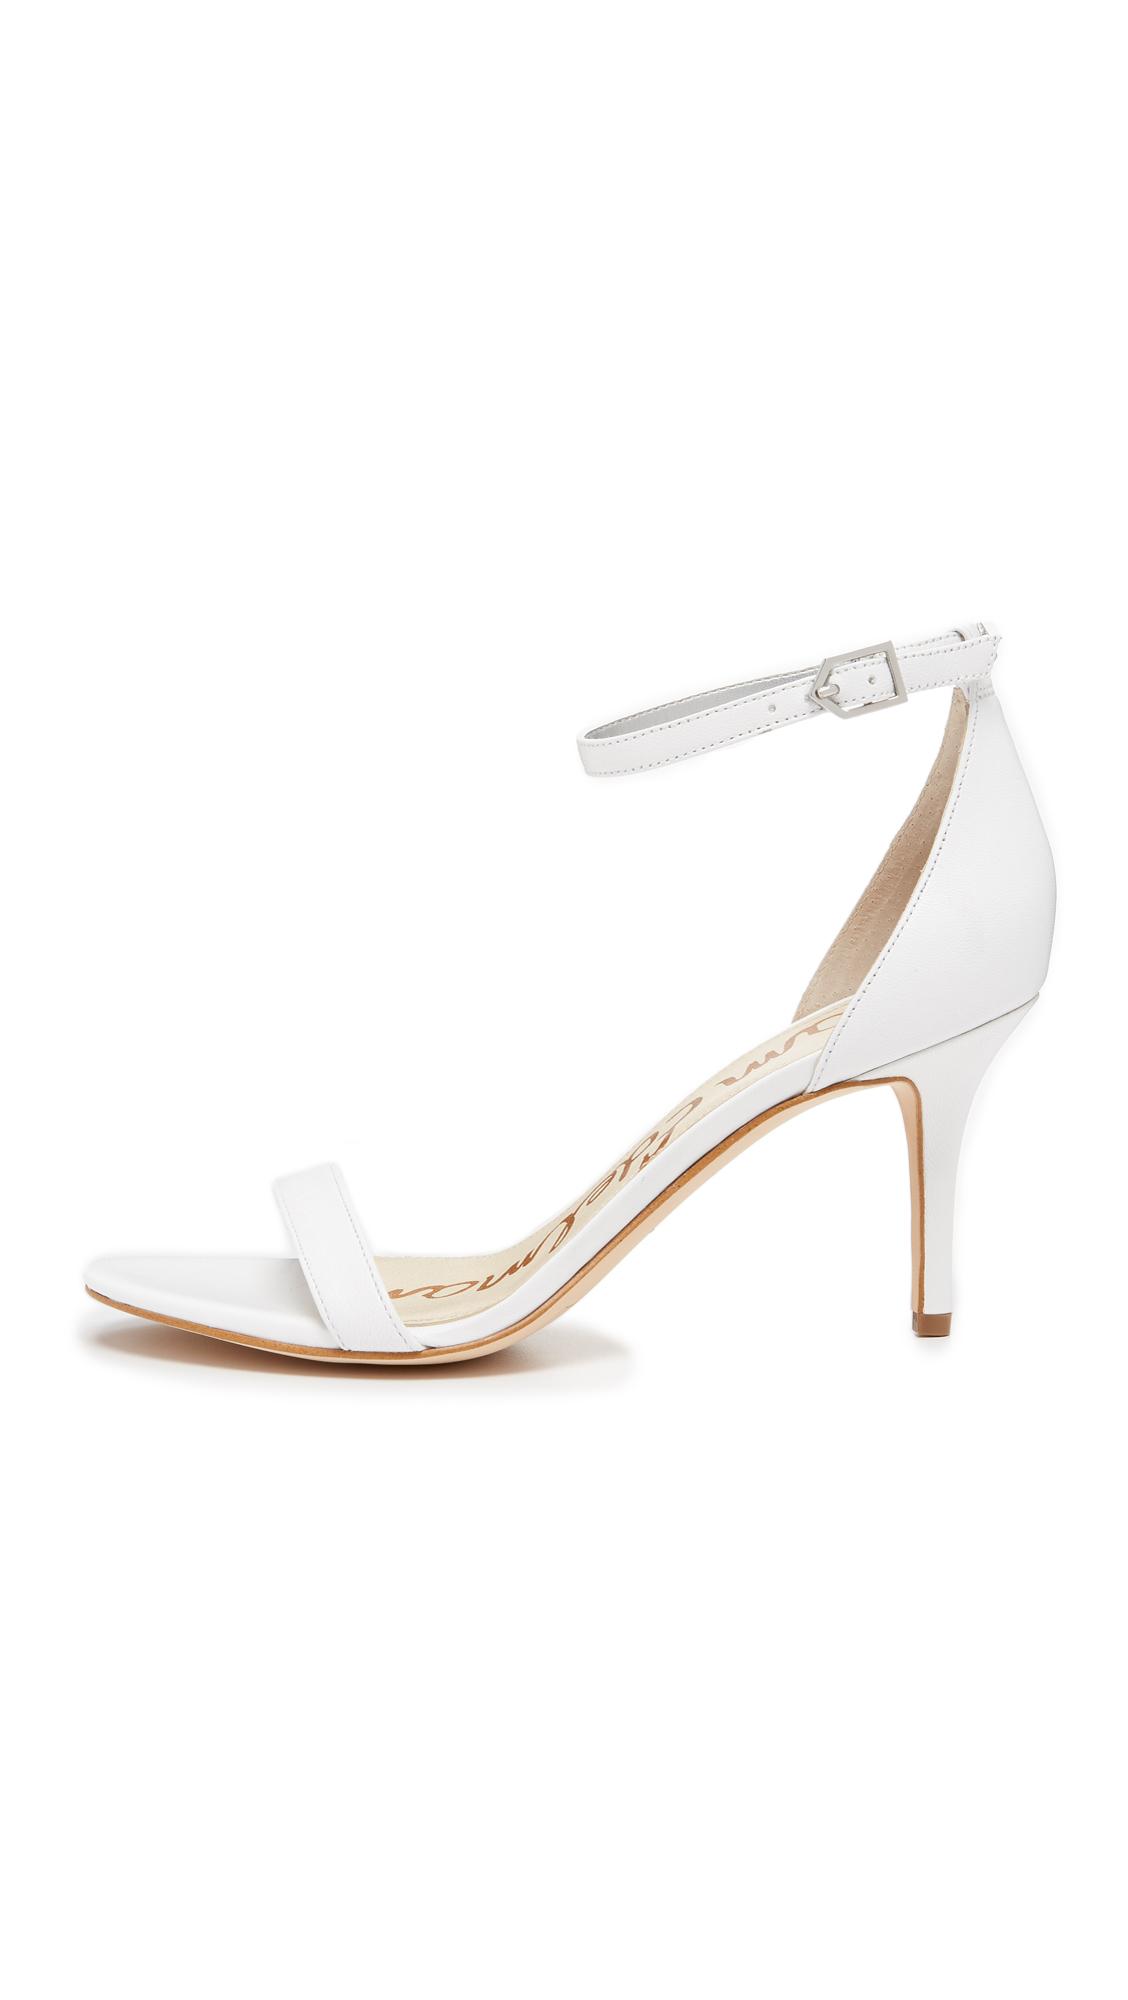 05f0eeaeea1 Lyst - Sam Edelman Patti Sandals in White